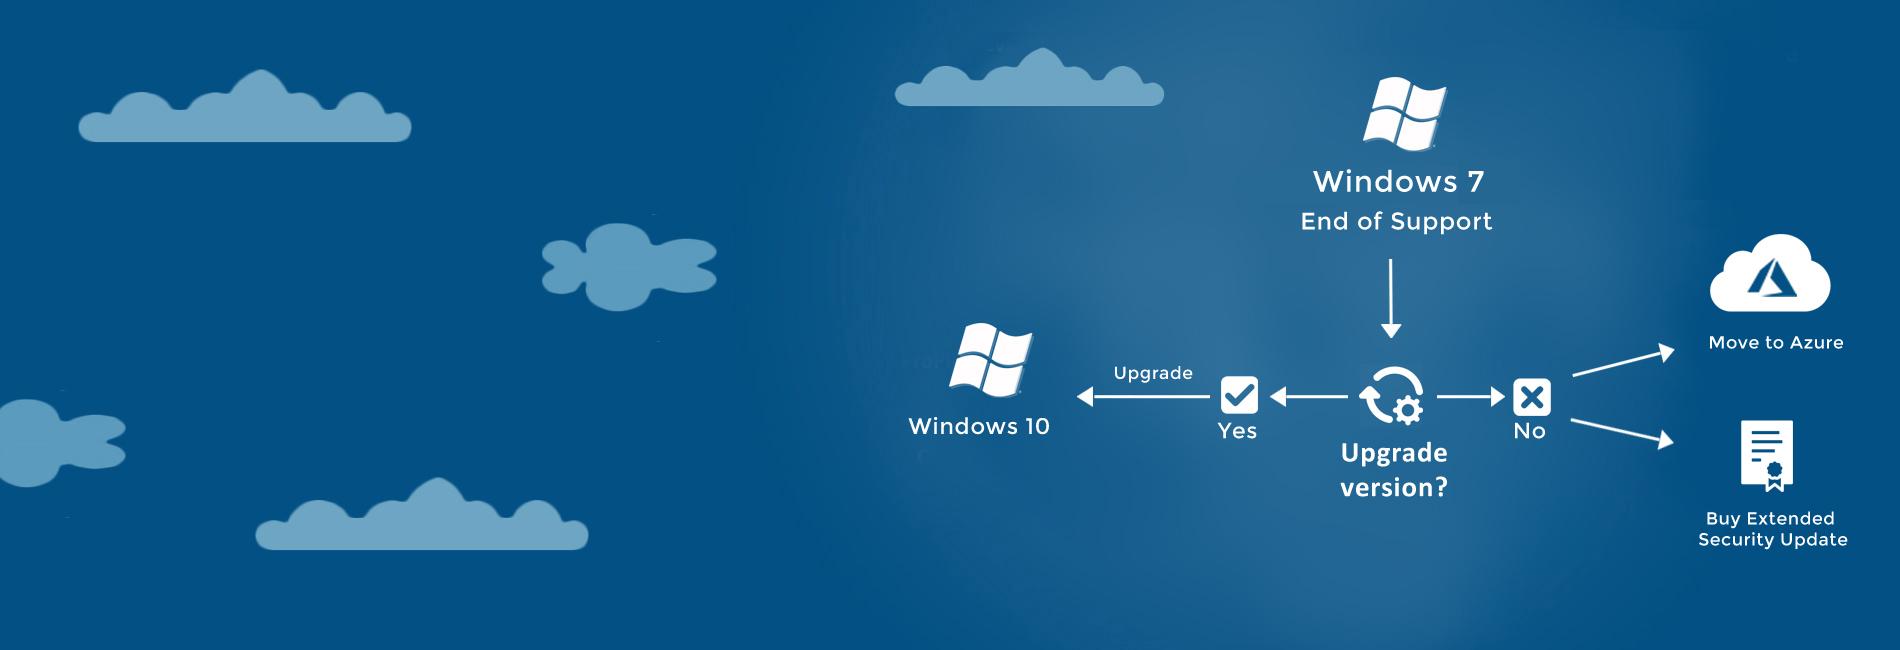 windows7 esu